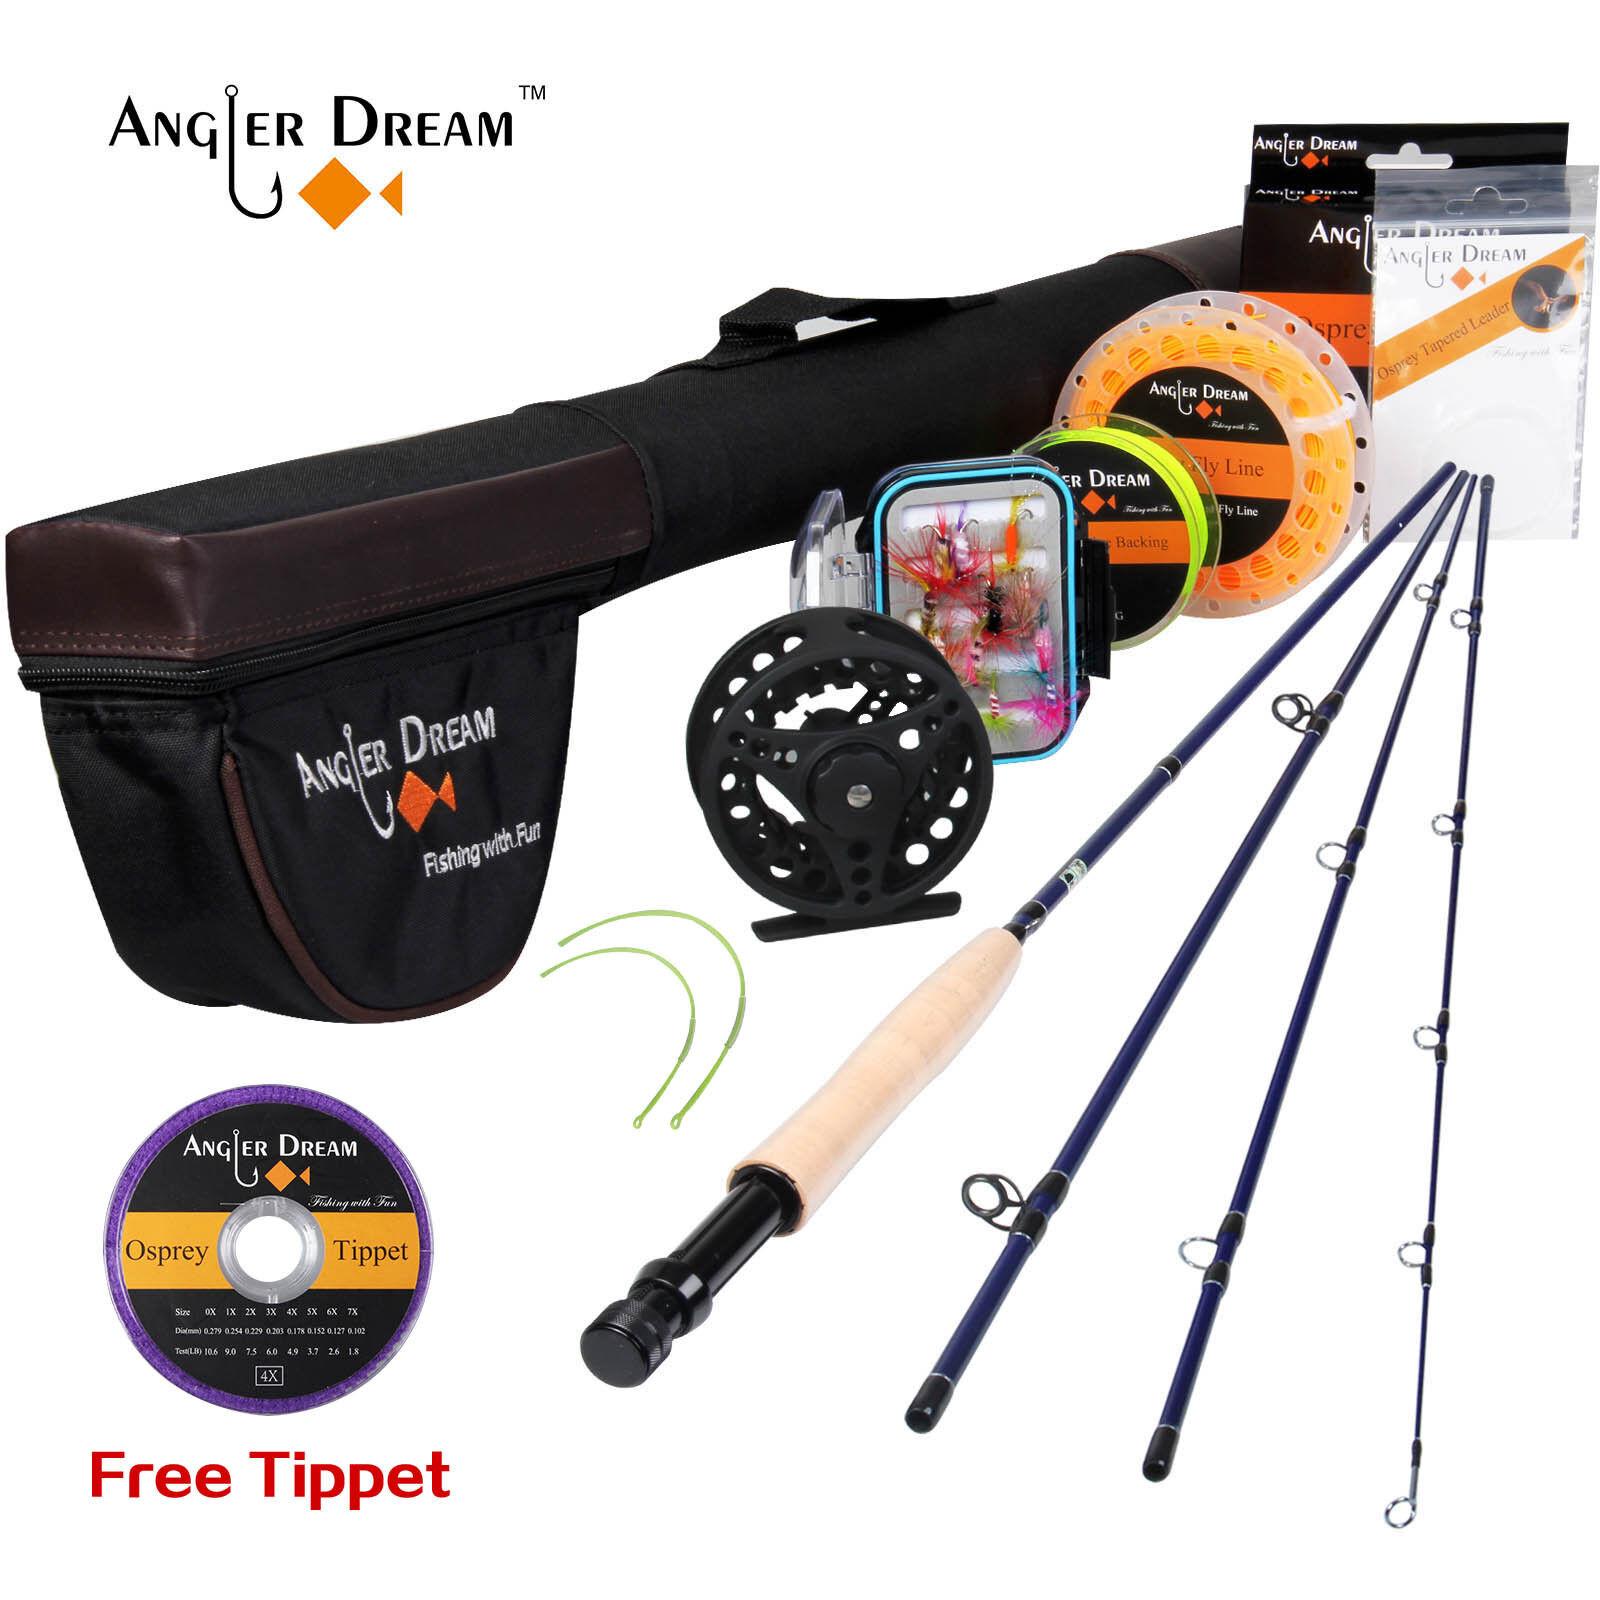 Fly Fishing Rod Combo 24T Carbon Fiber 8.39FT 35WT Access Fly Rod Fly Reel